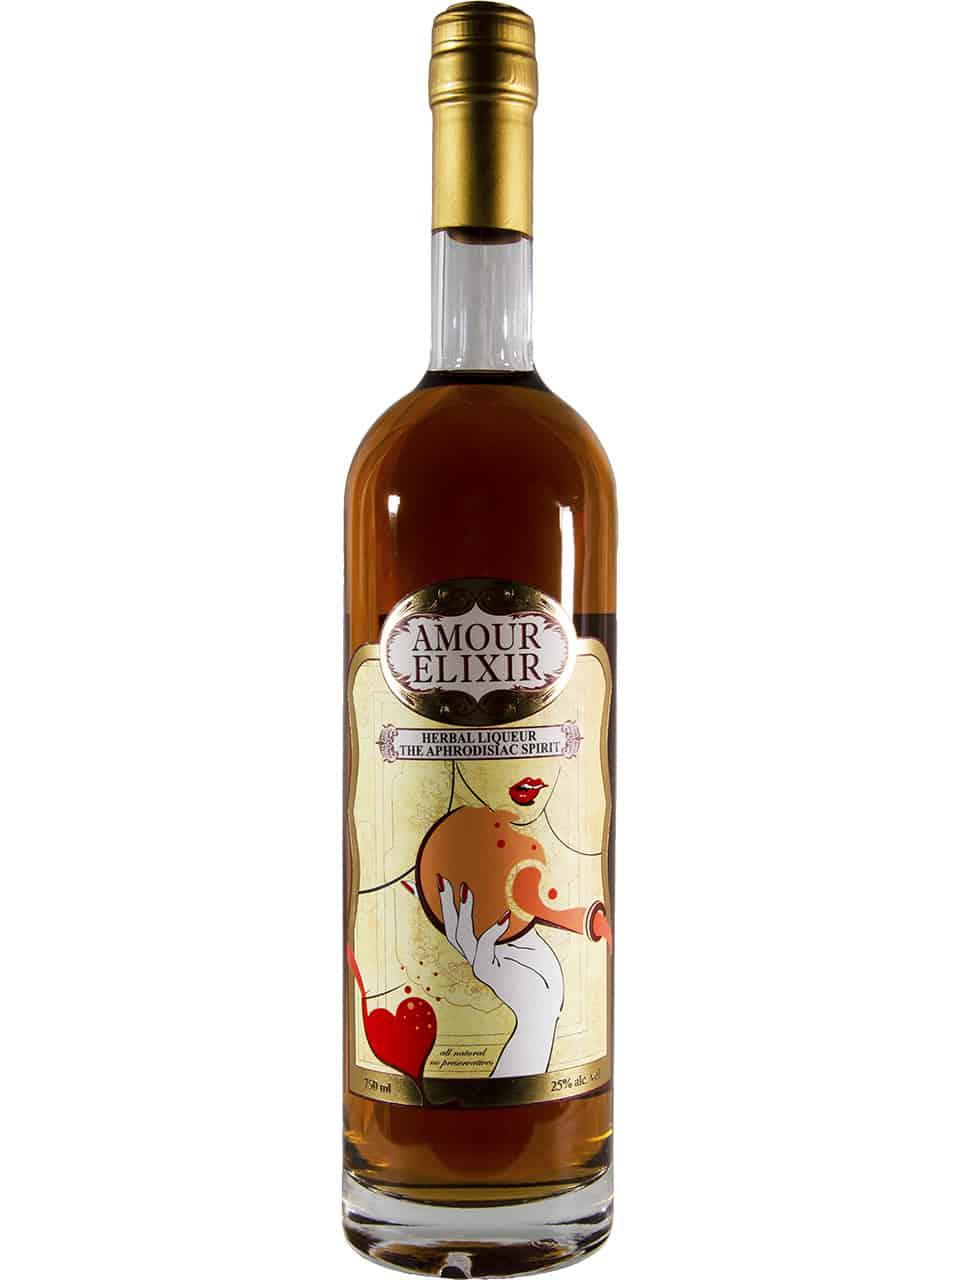 Amour Elixir Herbal Liqueur